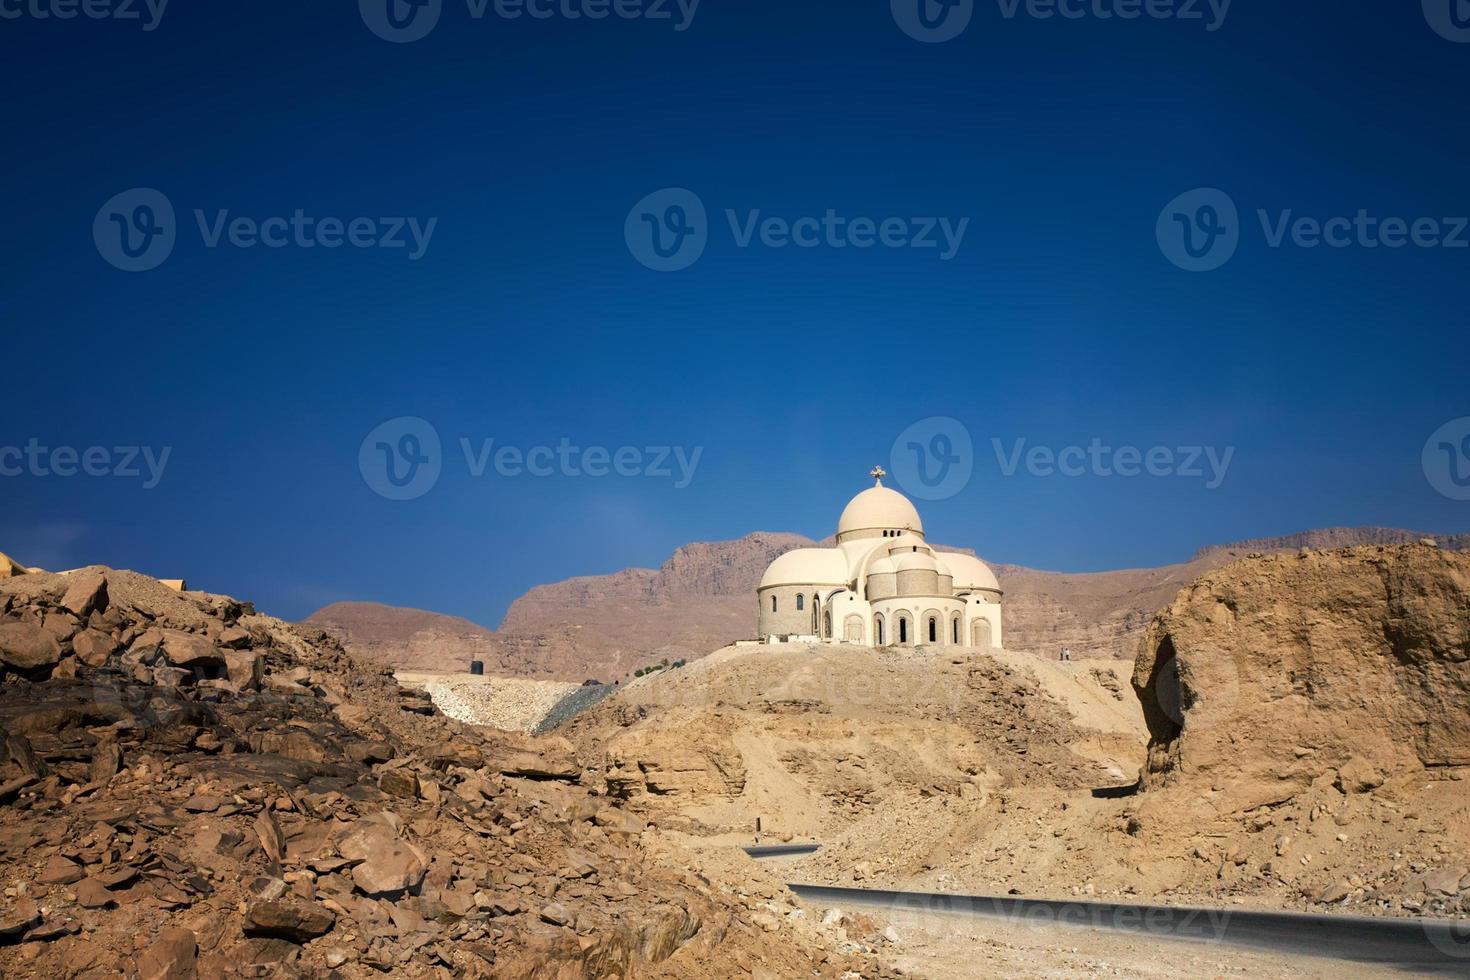 kathedraal in de woestijn foto